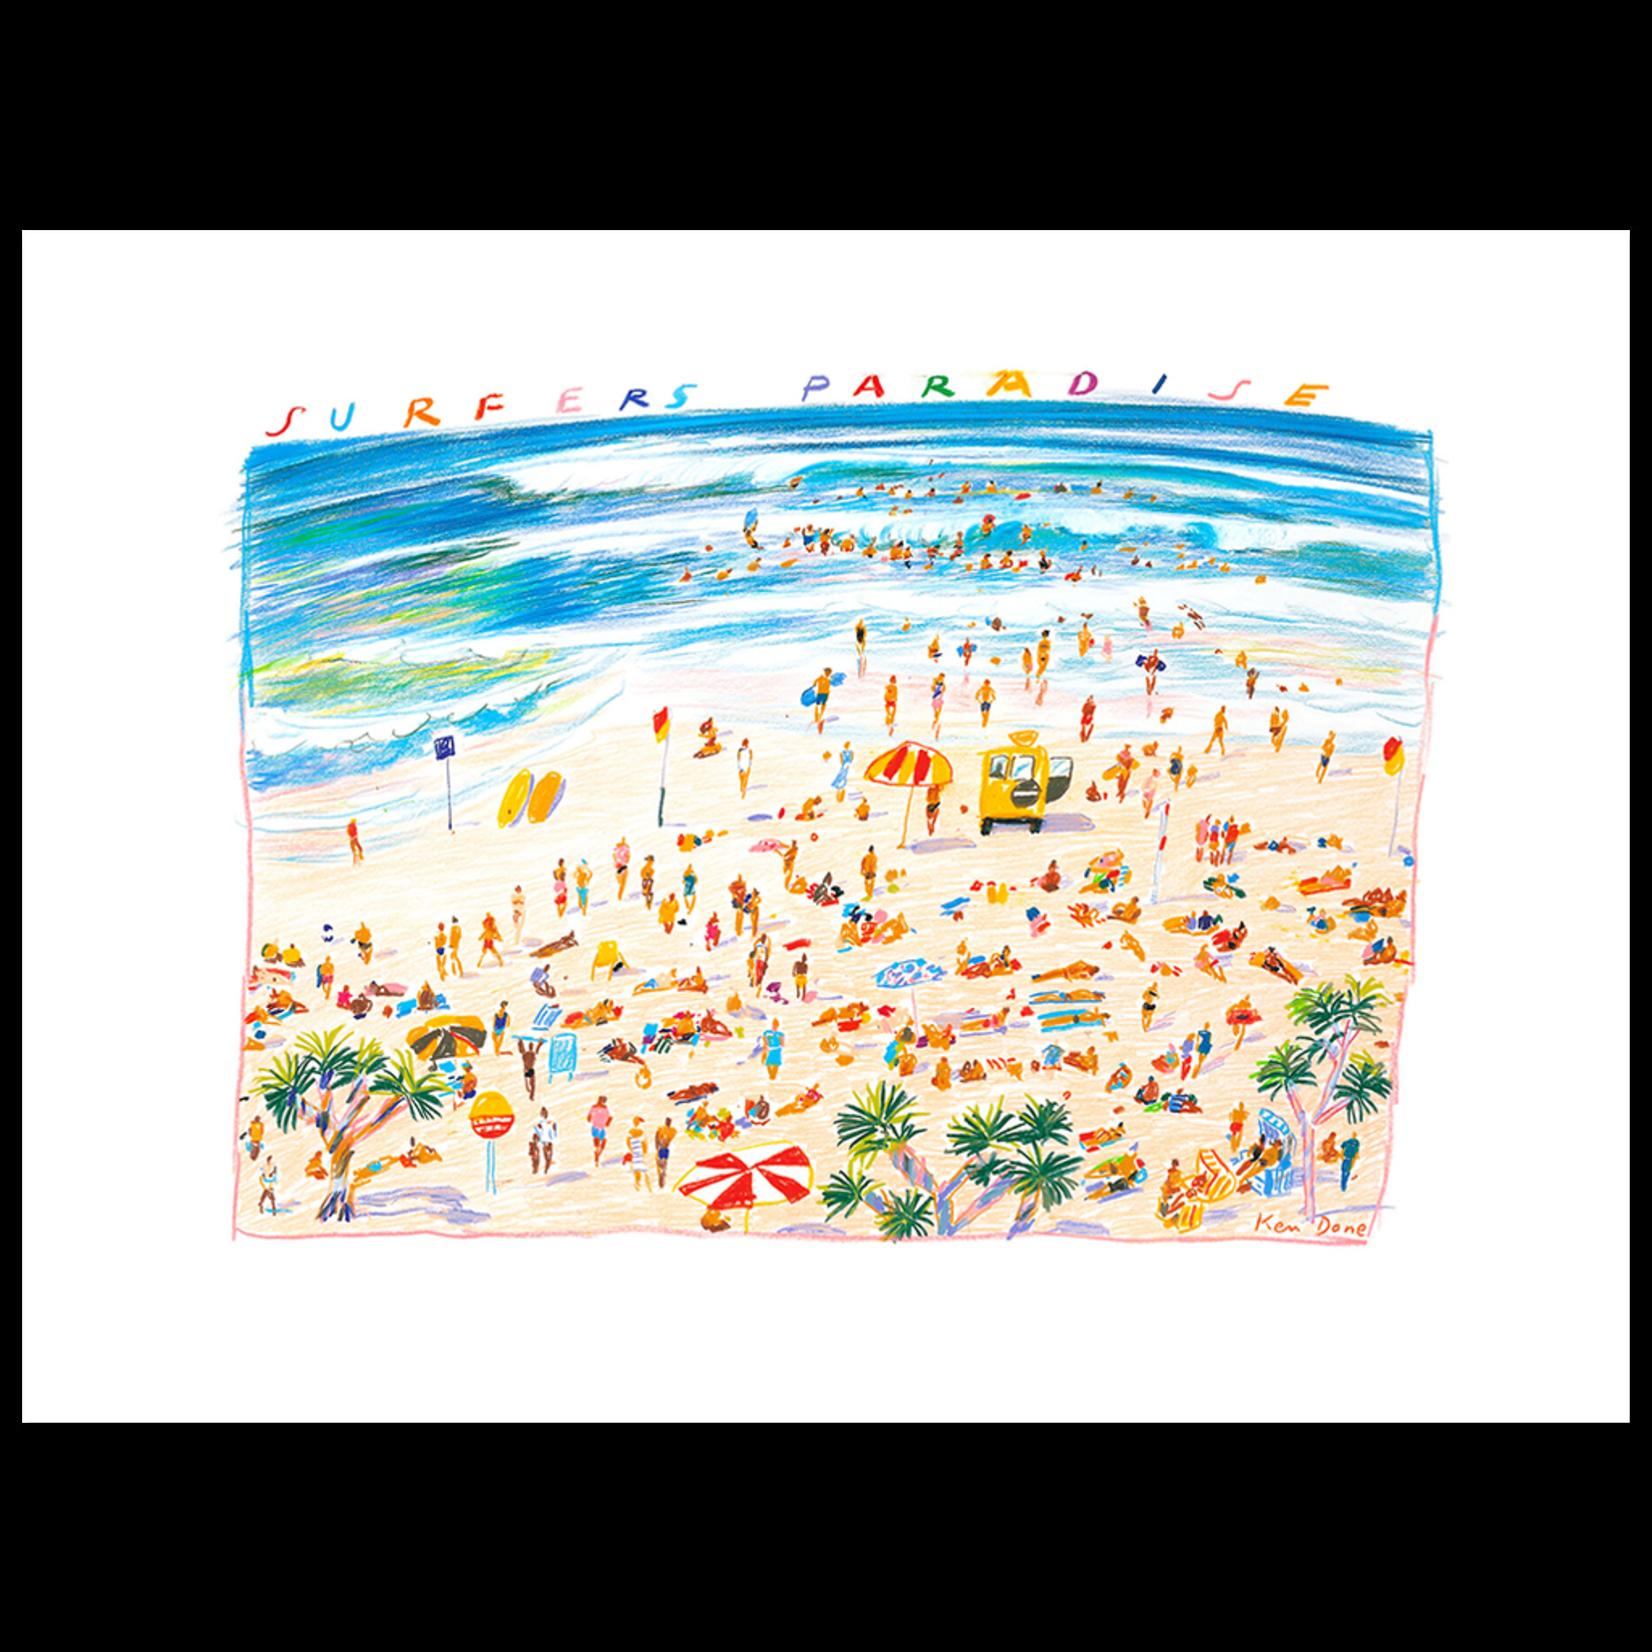 Limited Edition Prints Surfers Paradise, 1985